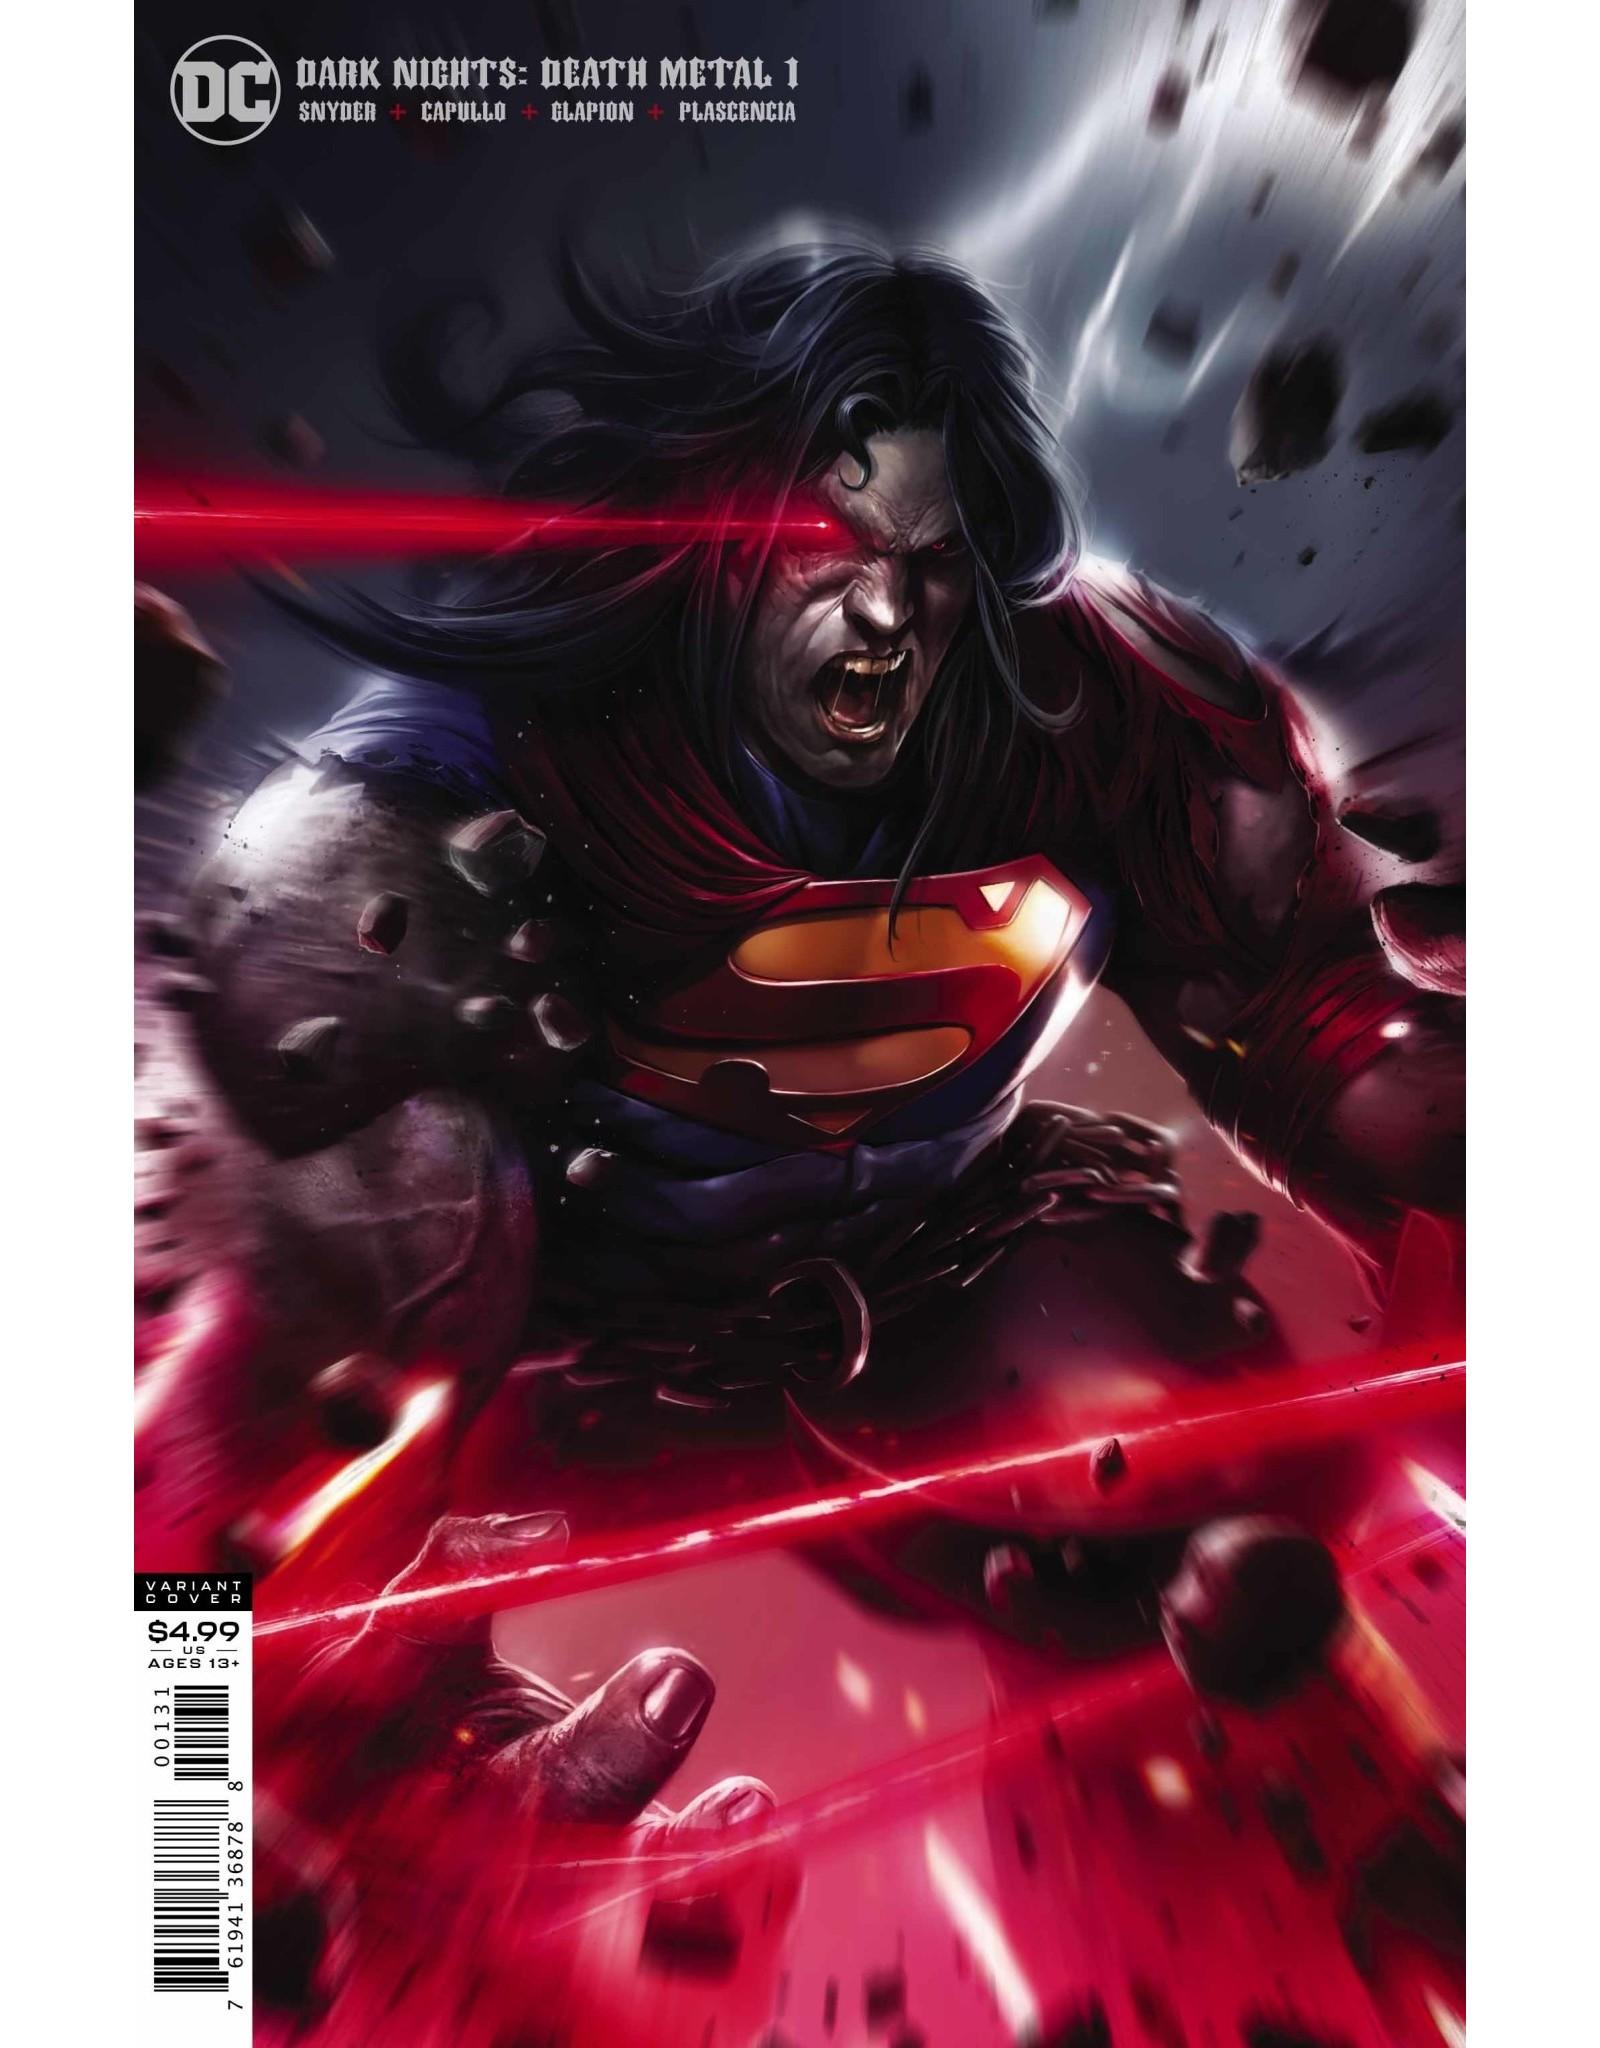 DC COMICS DARK NIGHTS DEATH METAL #1 (OF 6) MATTINA SUPERMAN VAR ED